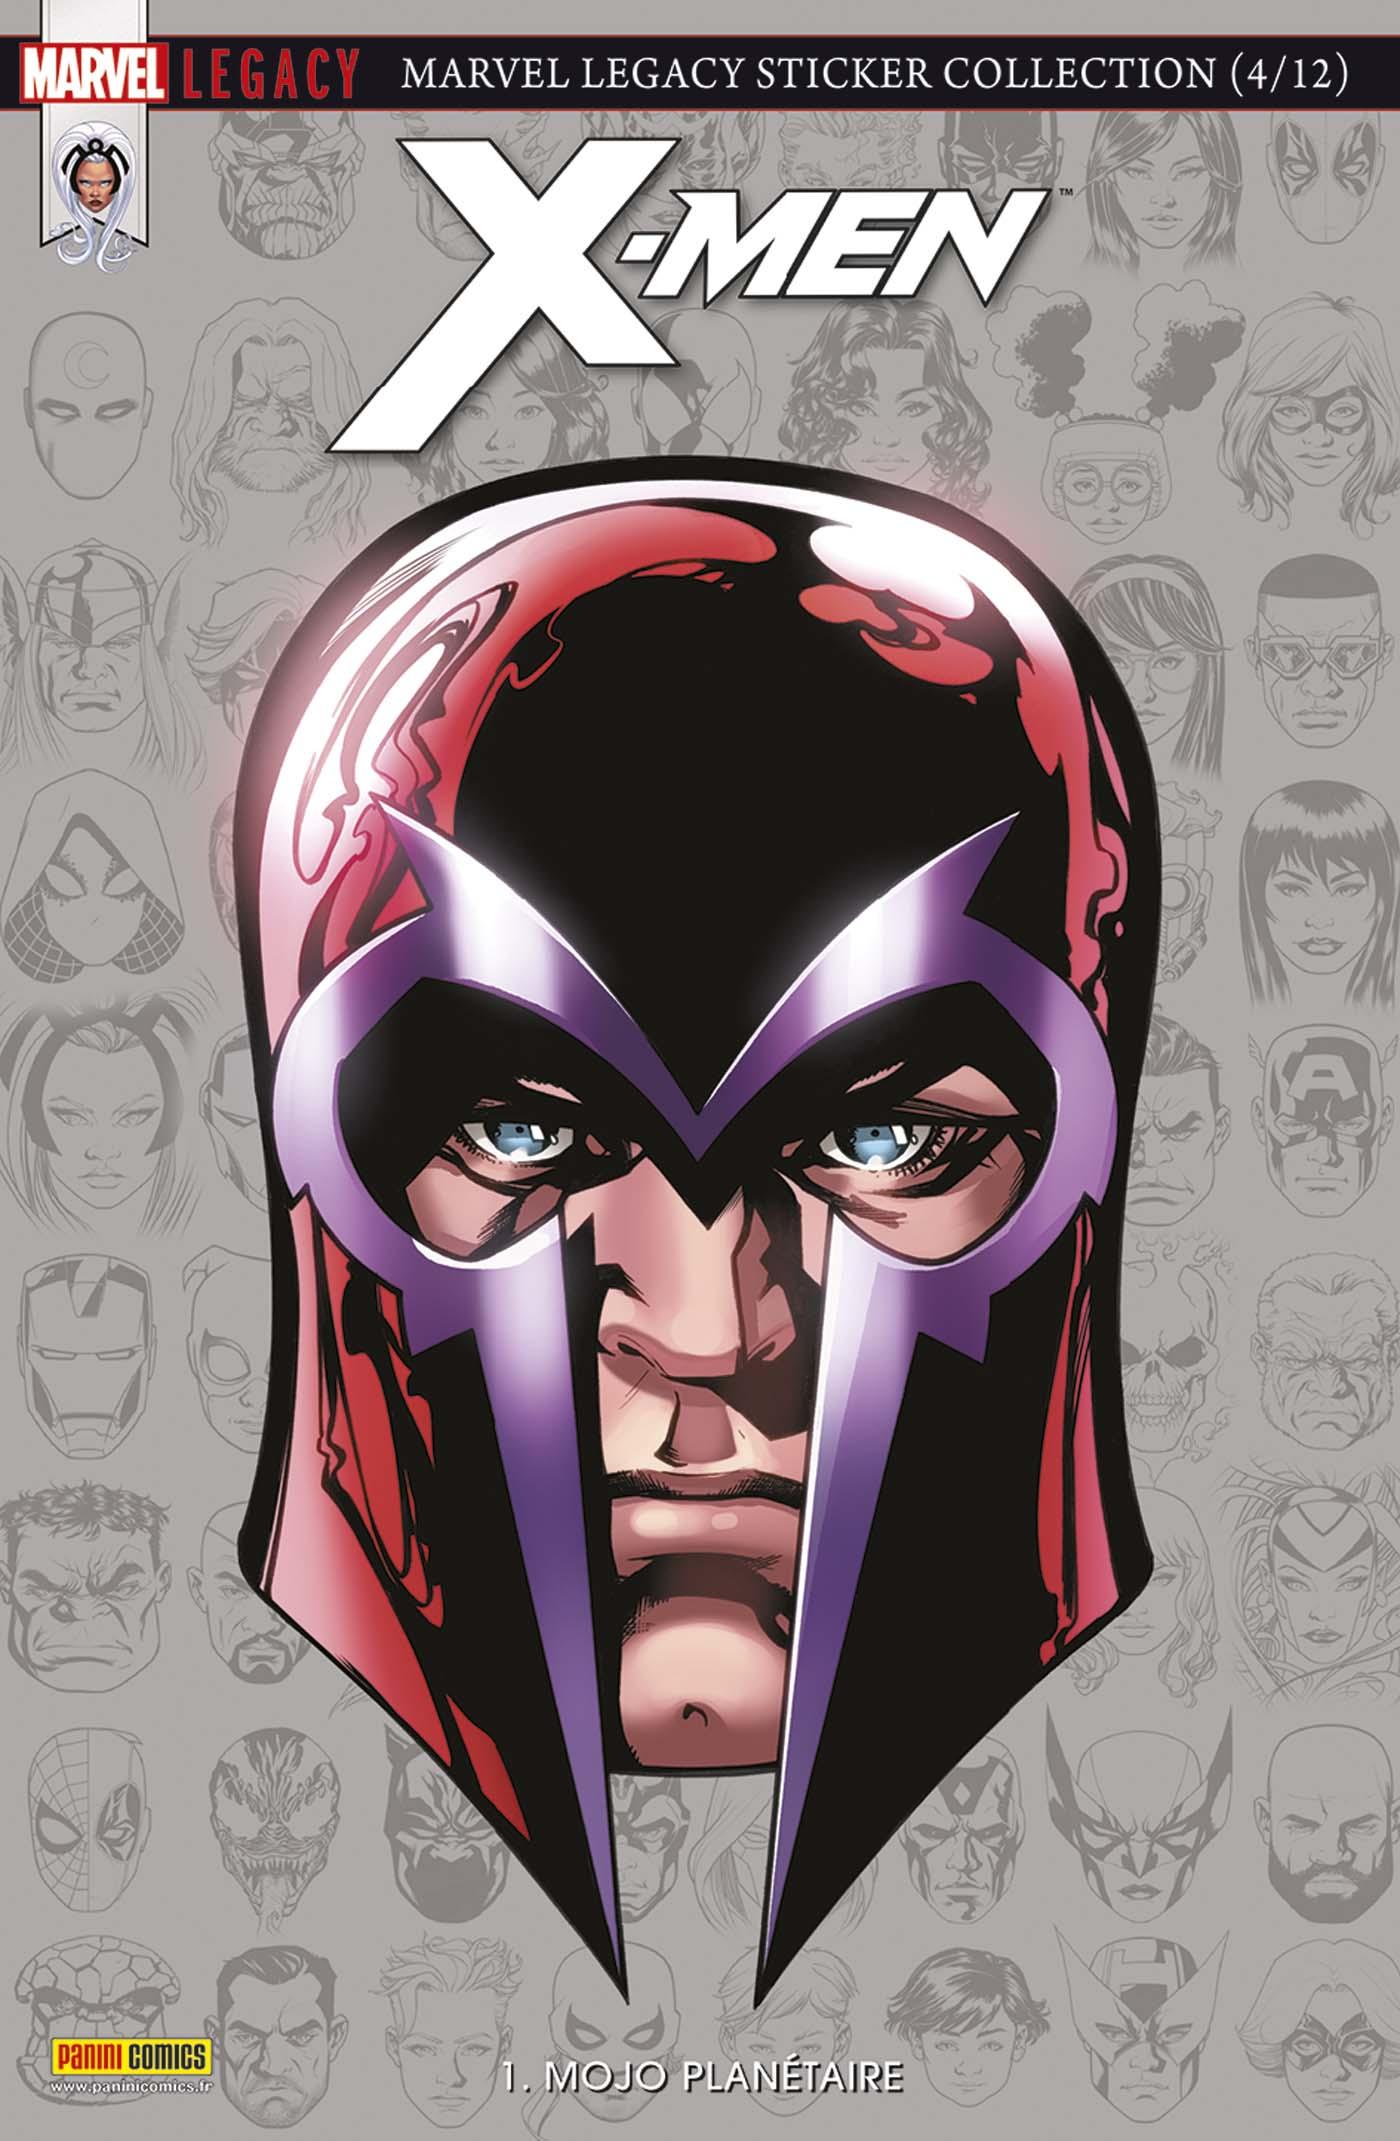 Marvel Legacy - X-Men 1 - Mojo Planétaire